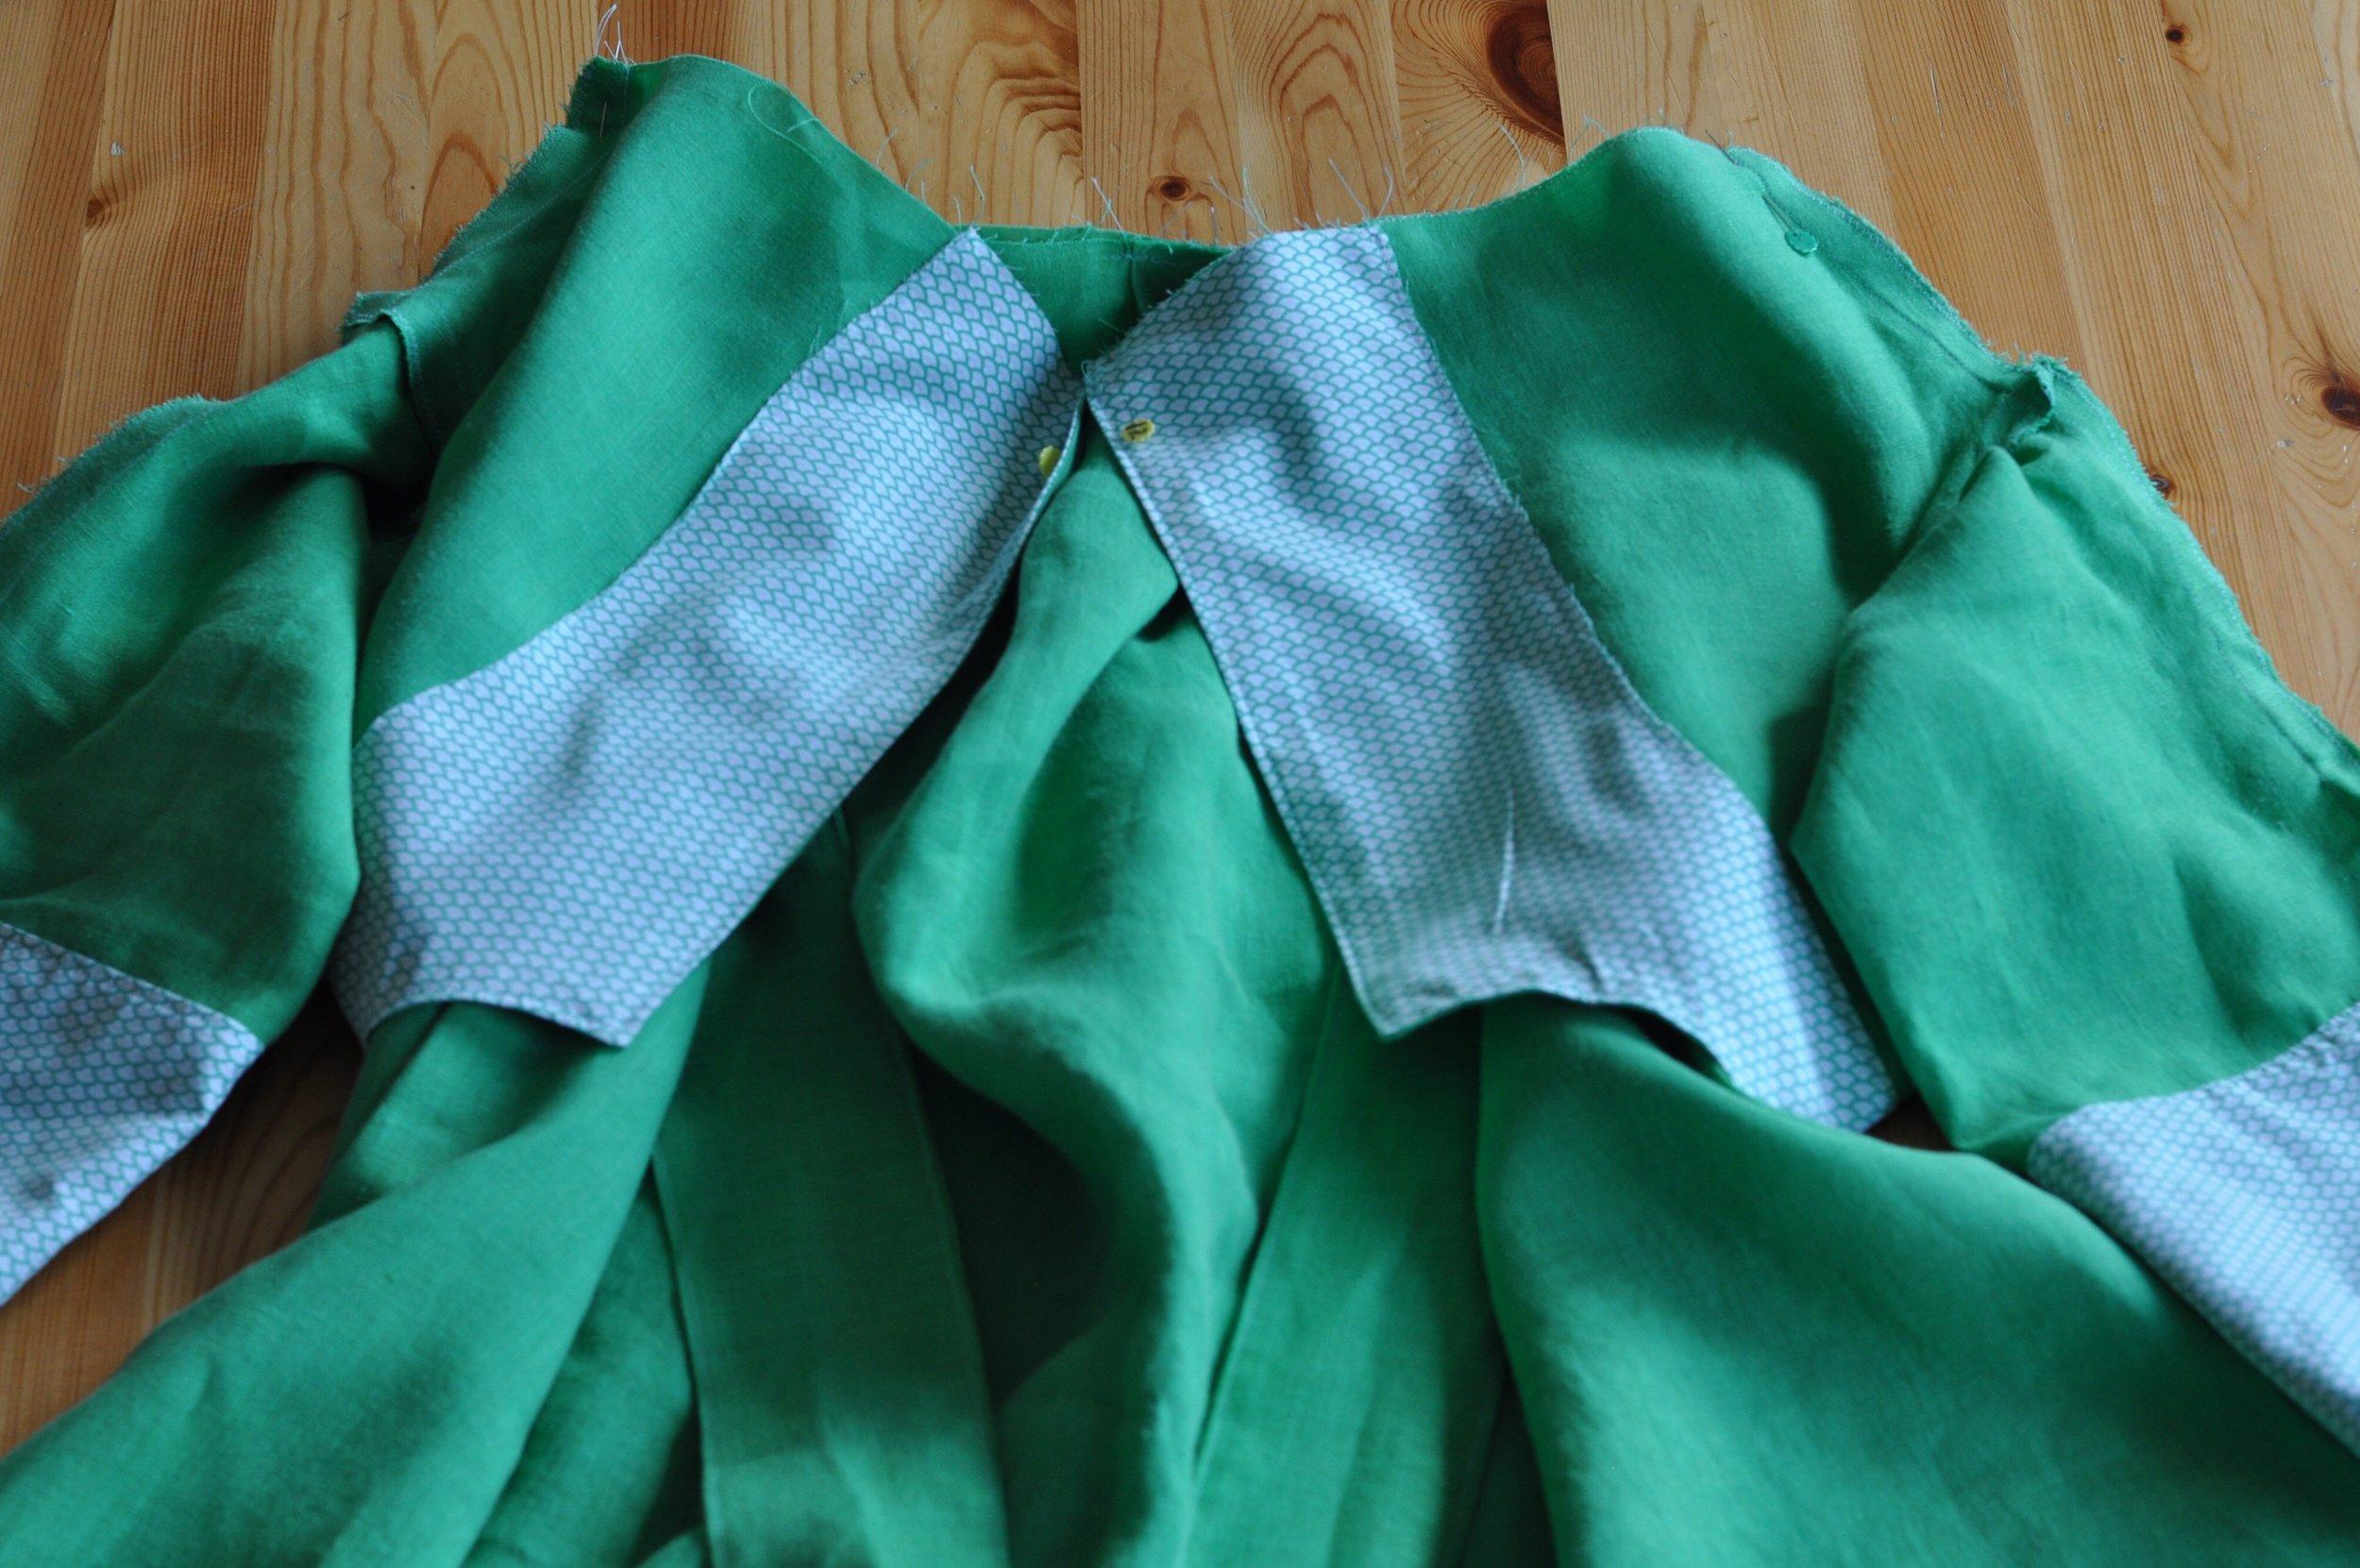 Schoolhouse Tunic Dress in process